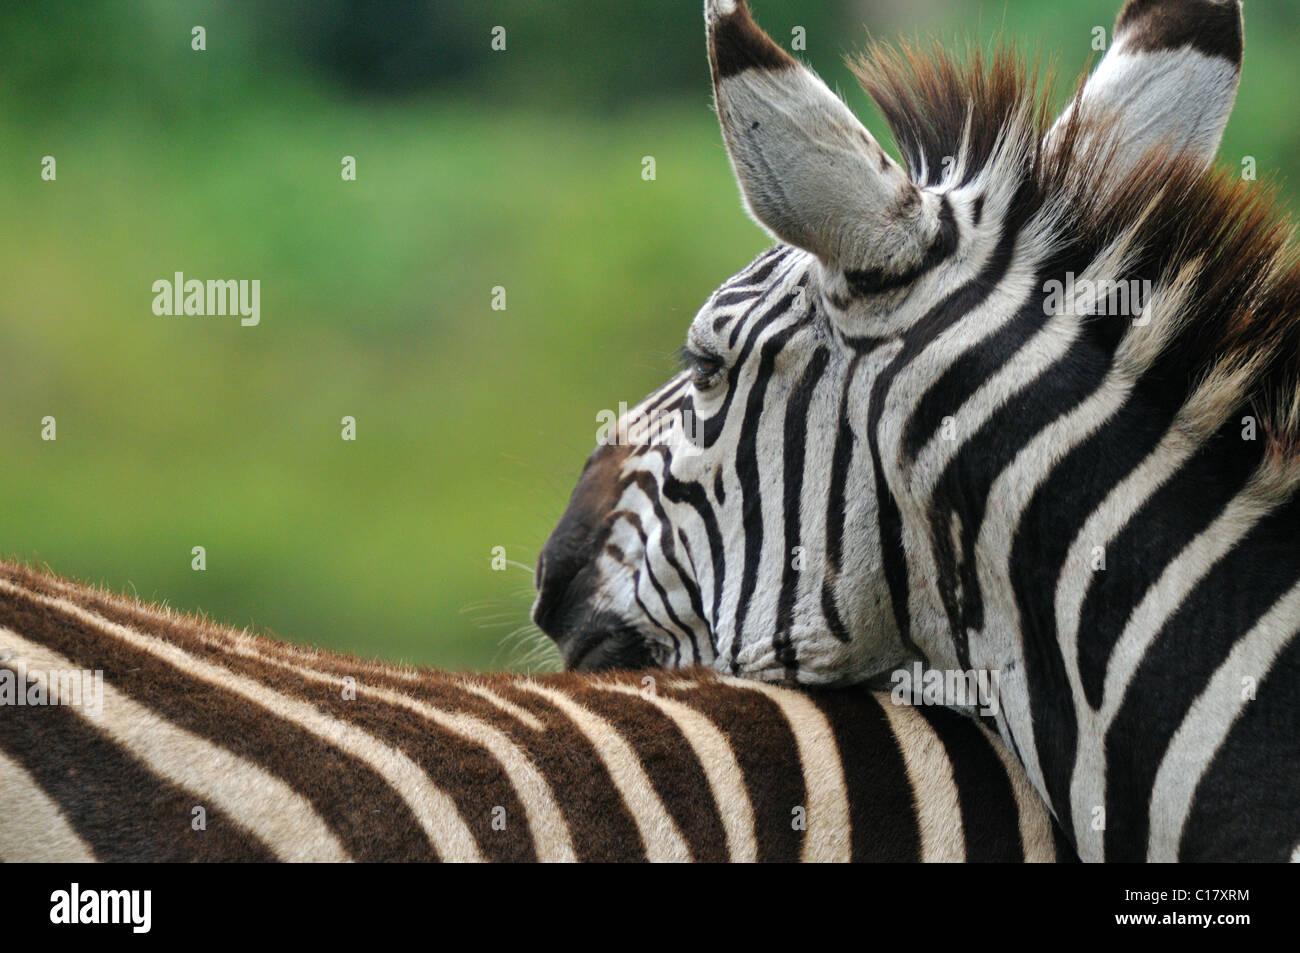 Zebra near Arusha Tanzania - Stock Image